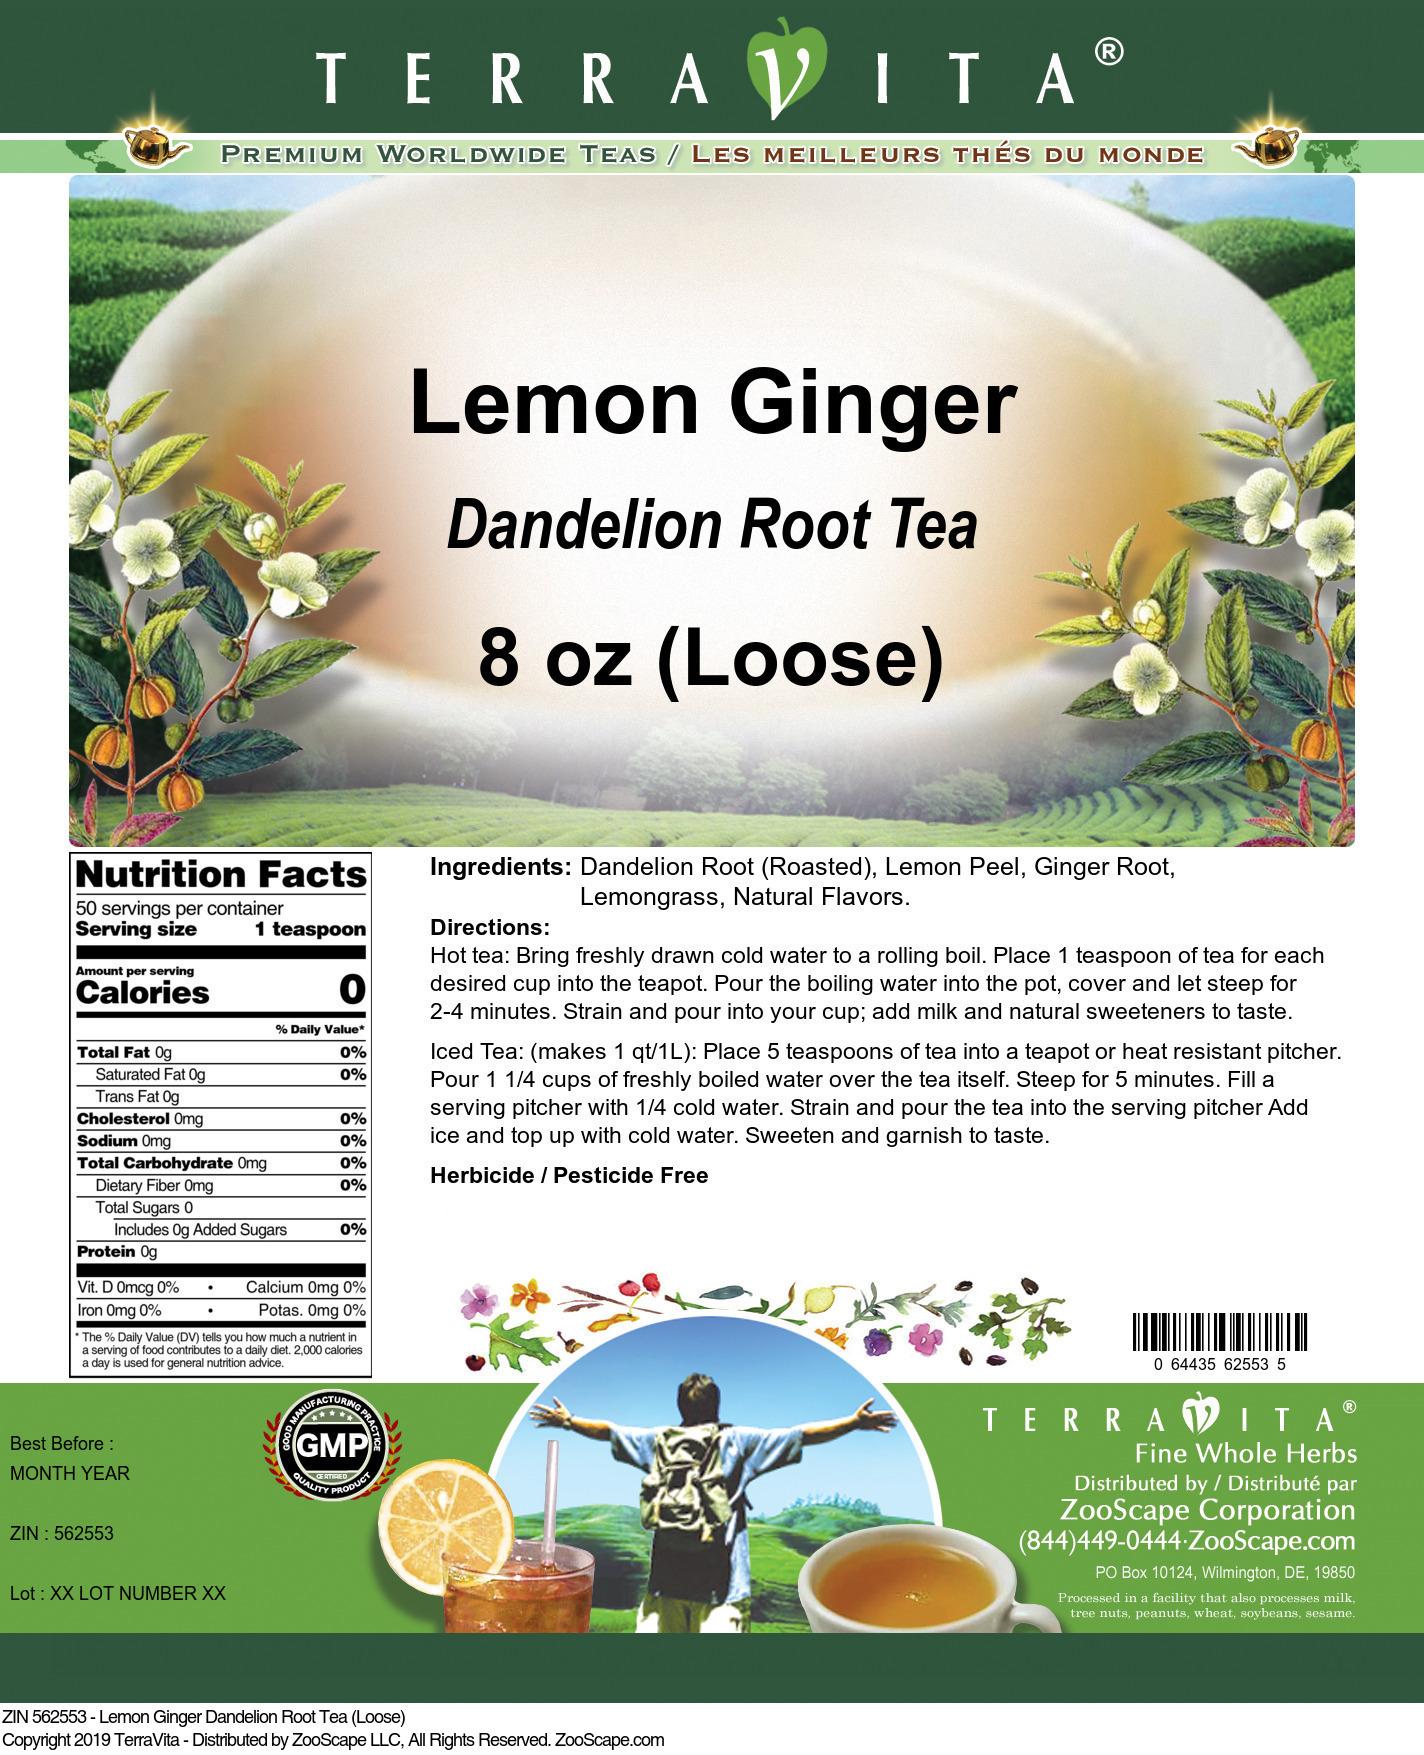 Lemon Ginger Dandelion Root Tea (Loose)